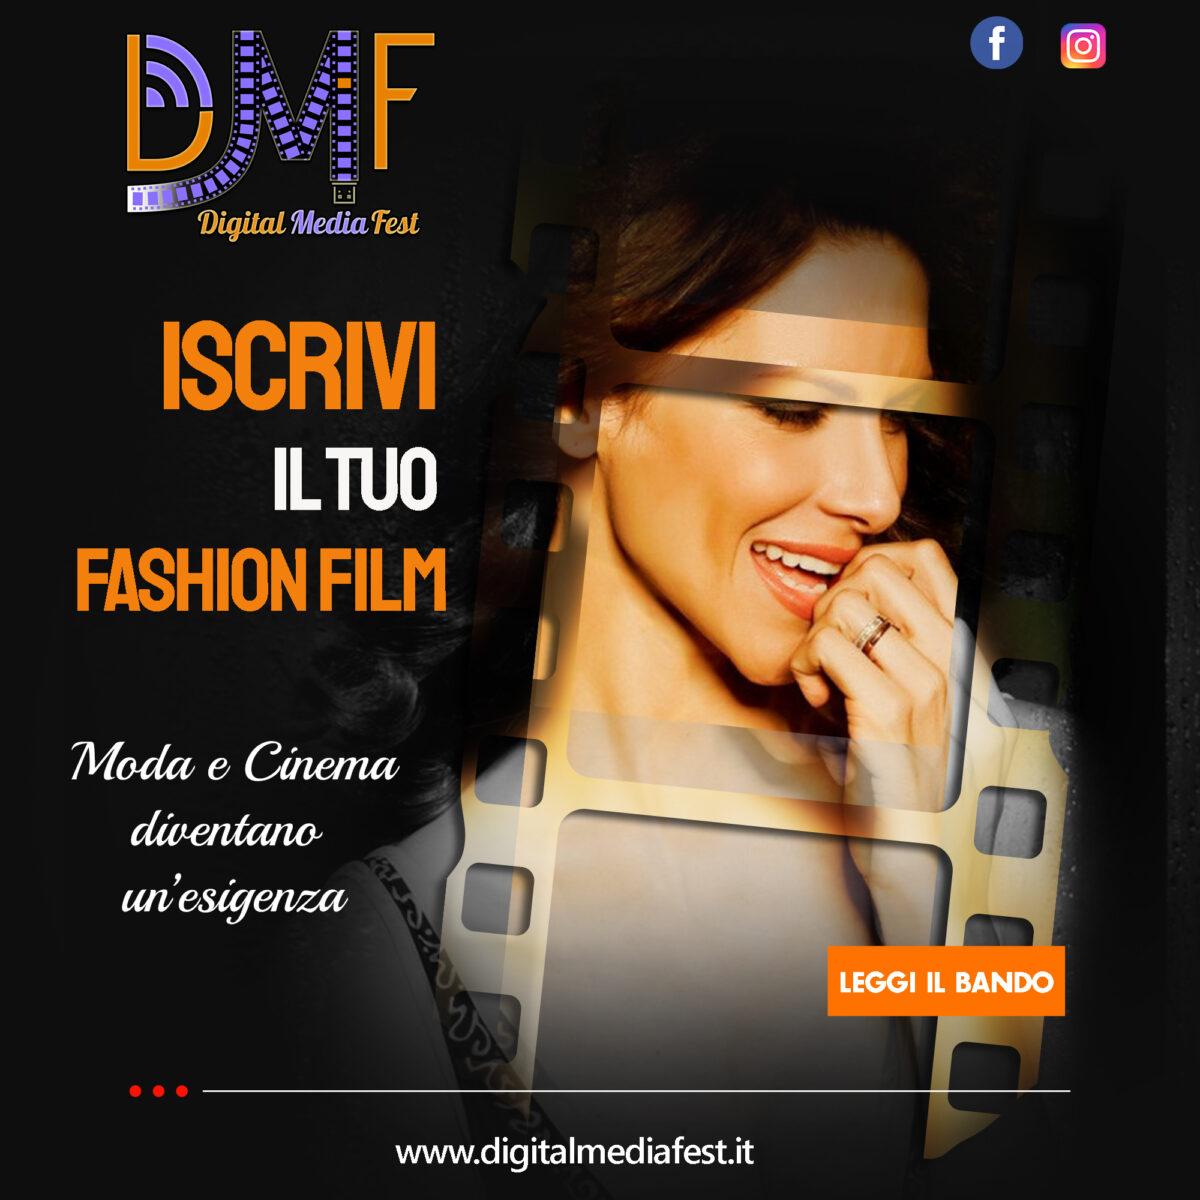 Al Digital Media Fest la moda diventa cinema